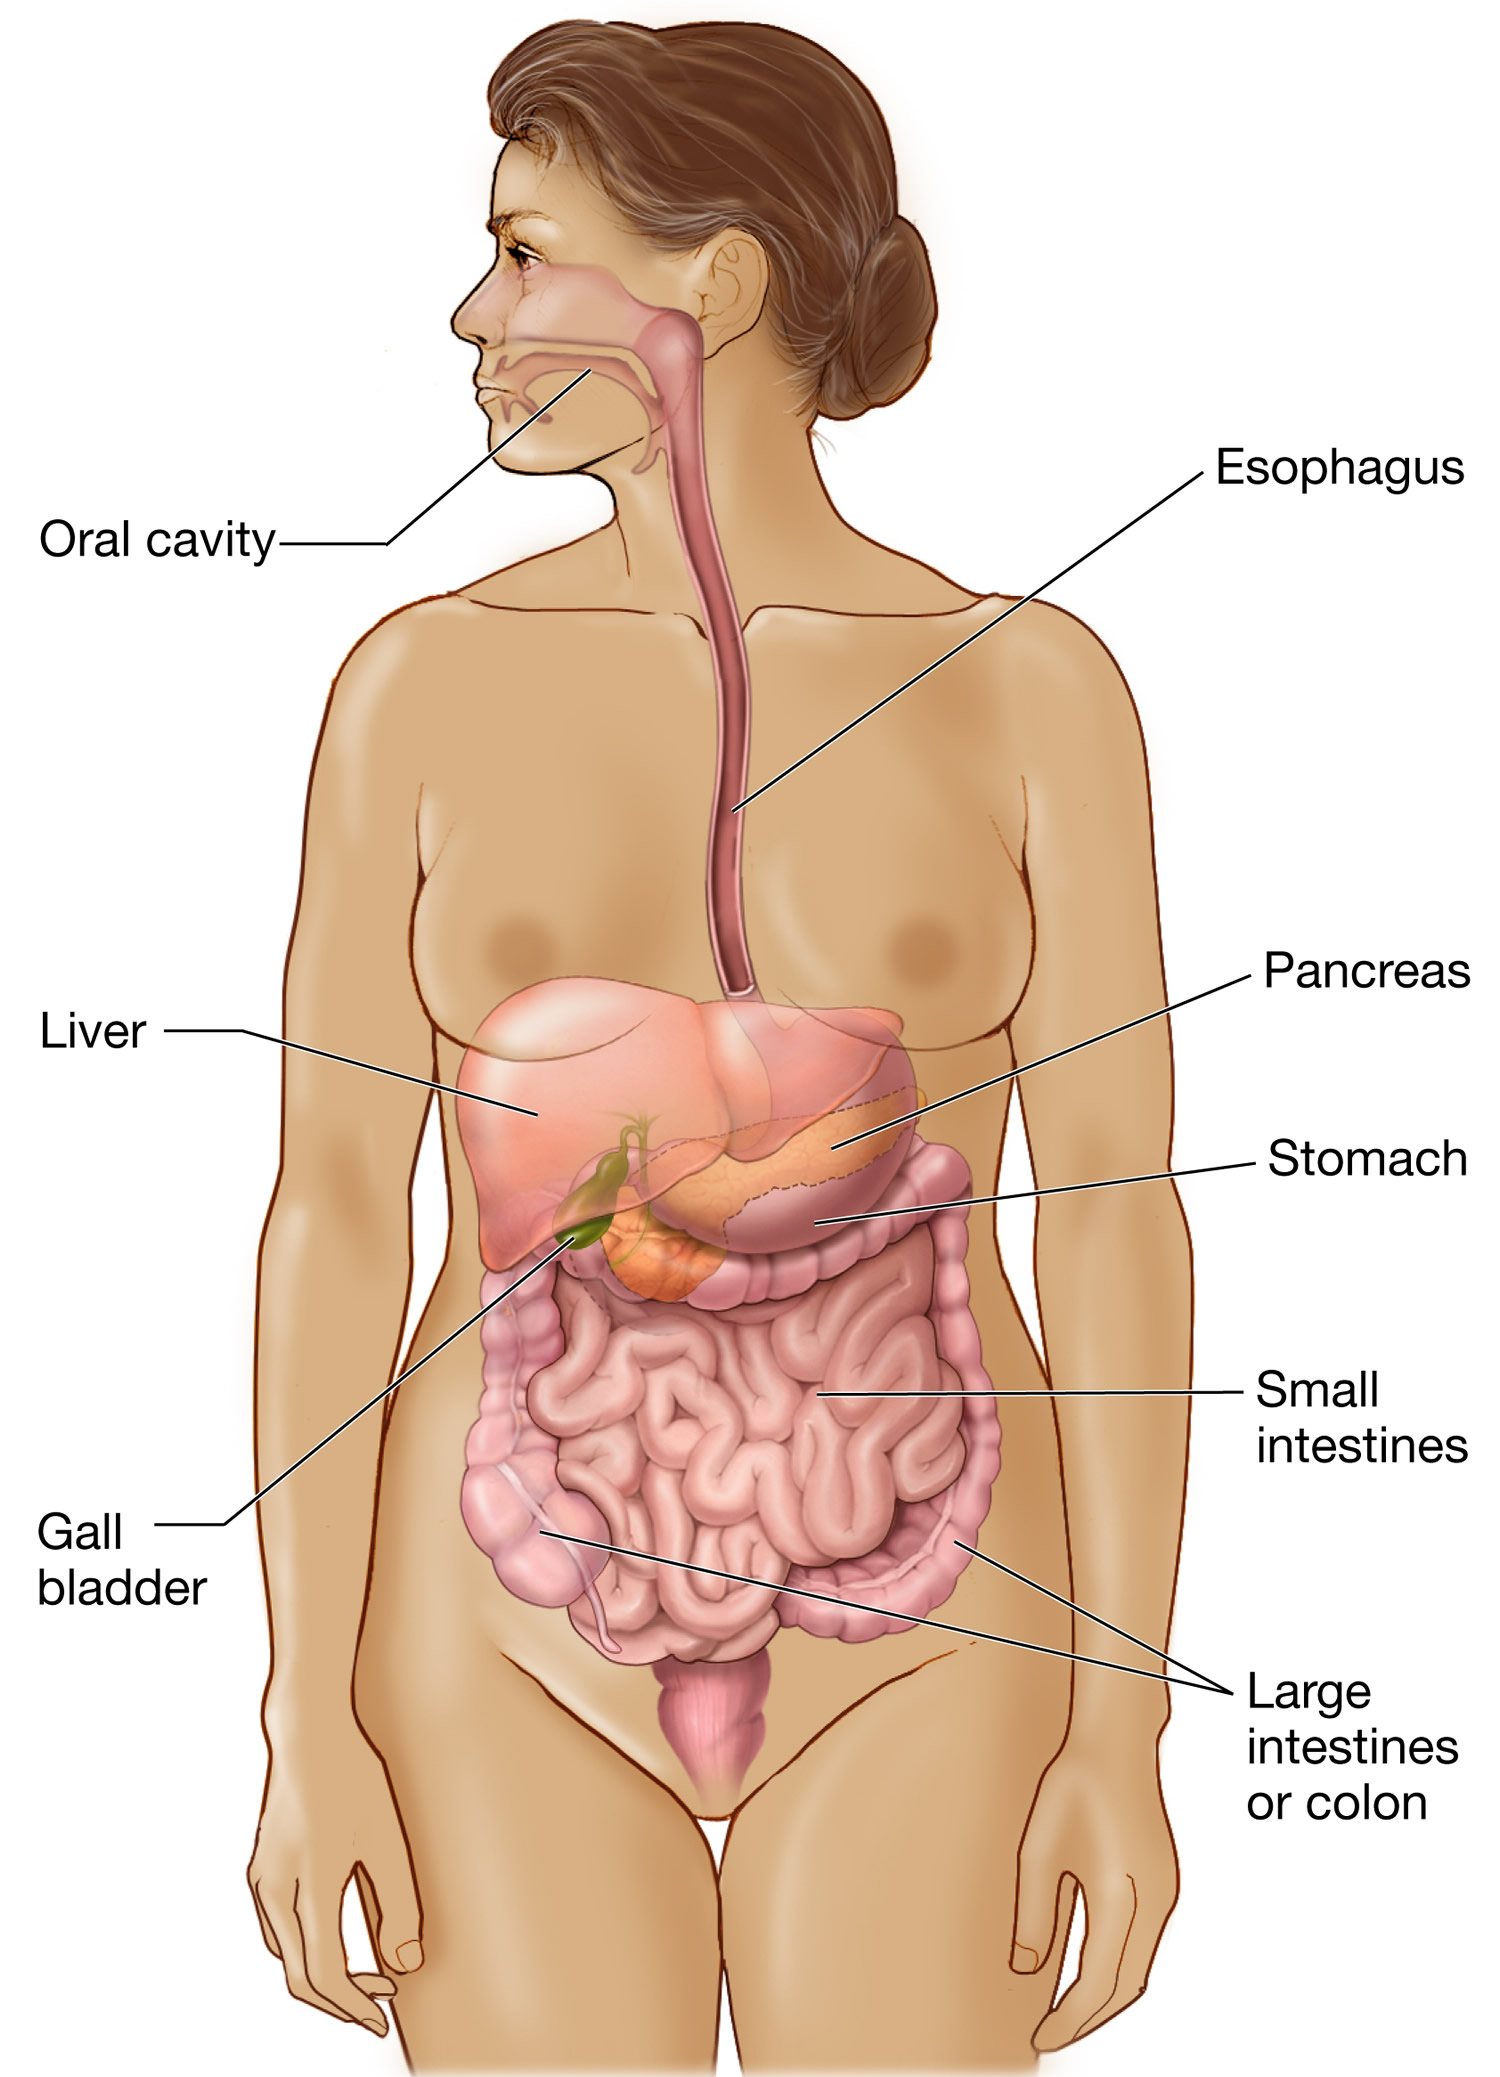 Gastrointestinal system - digestive system